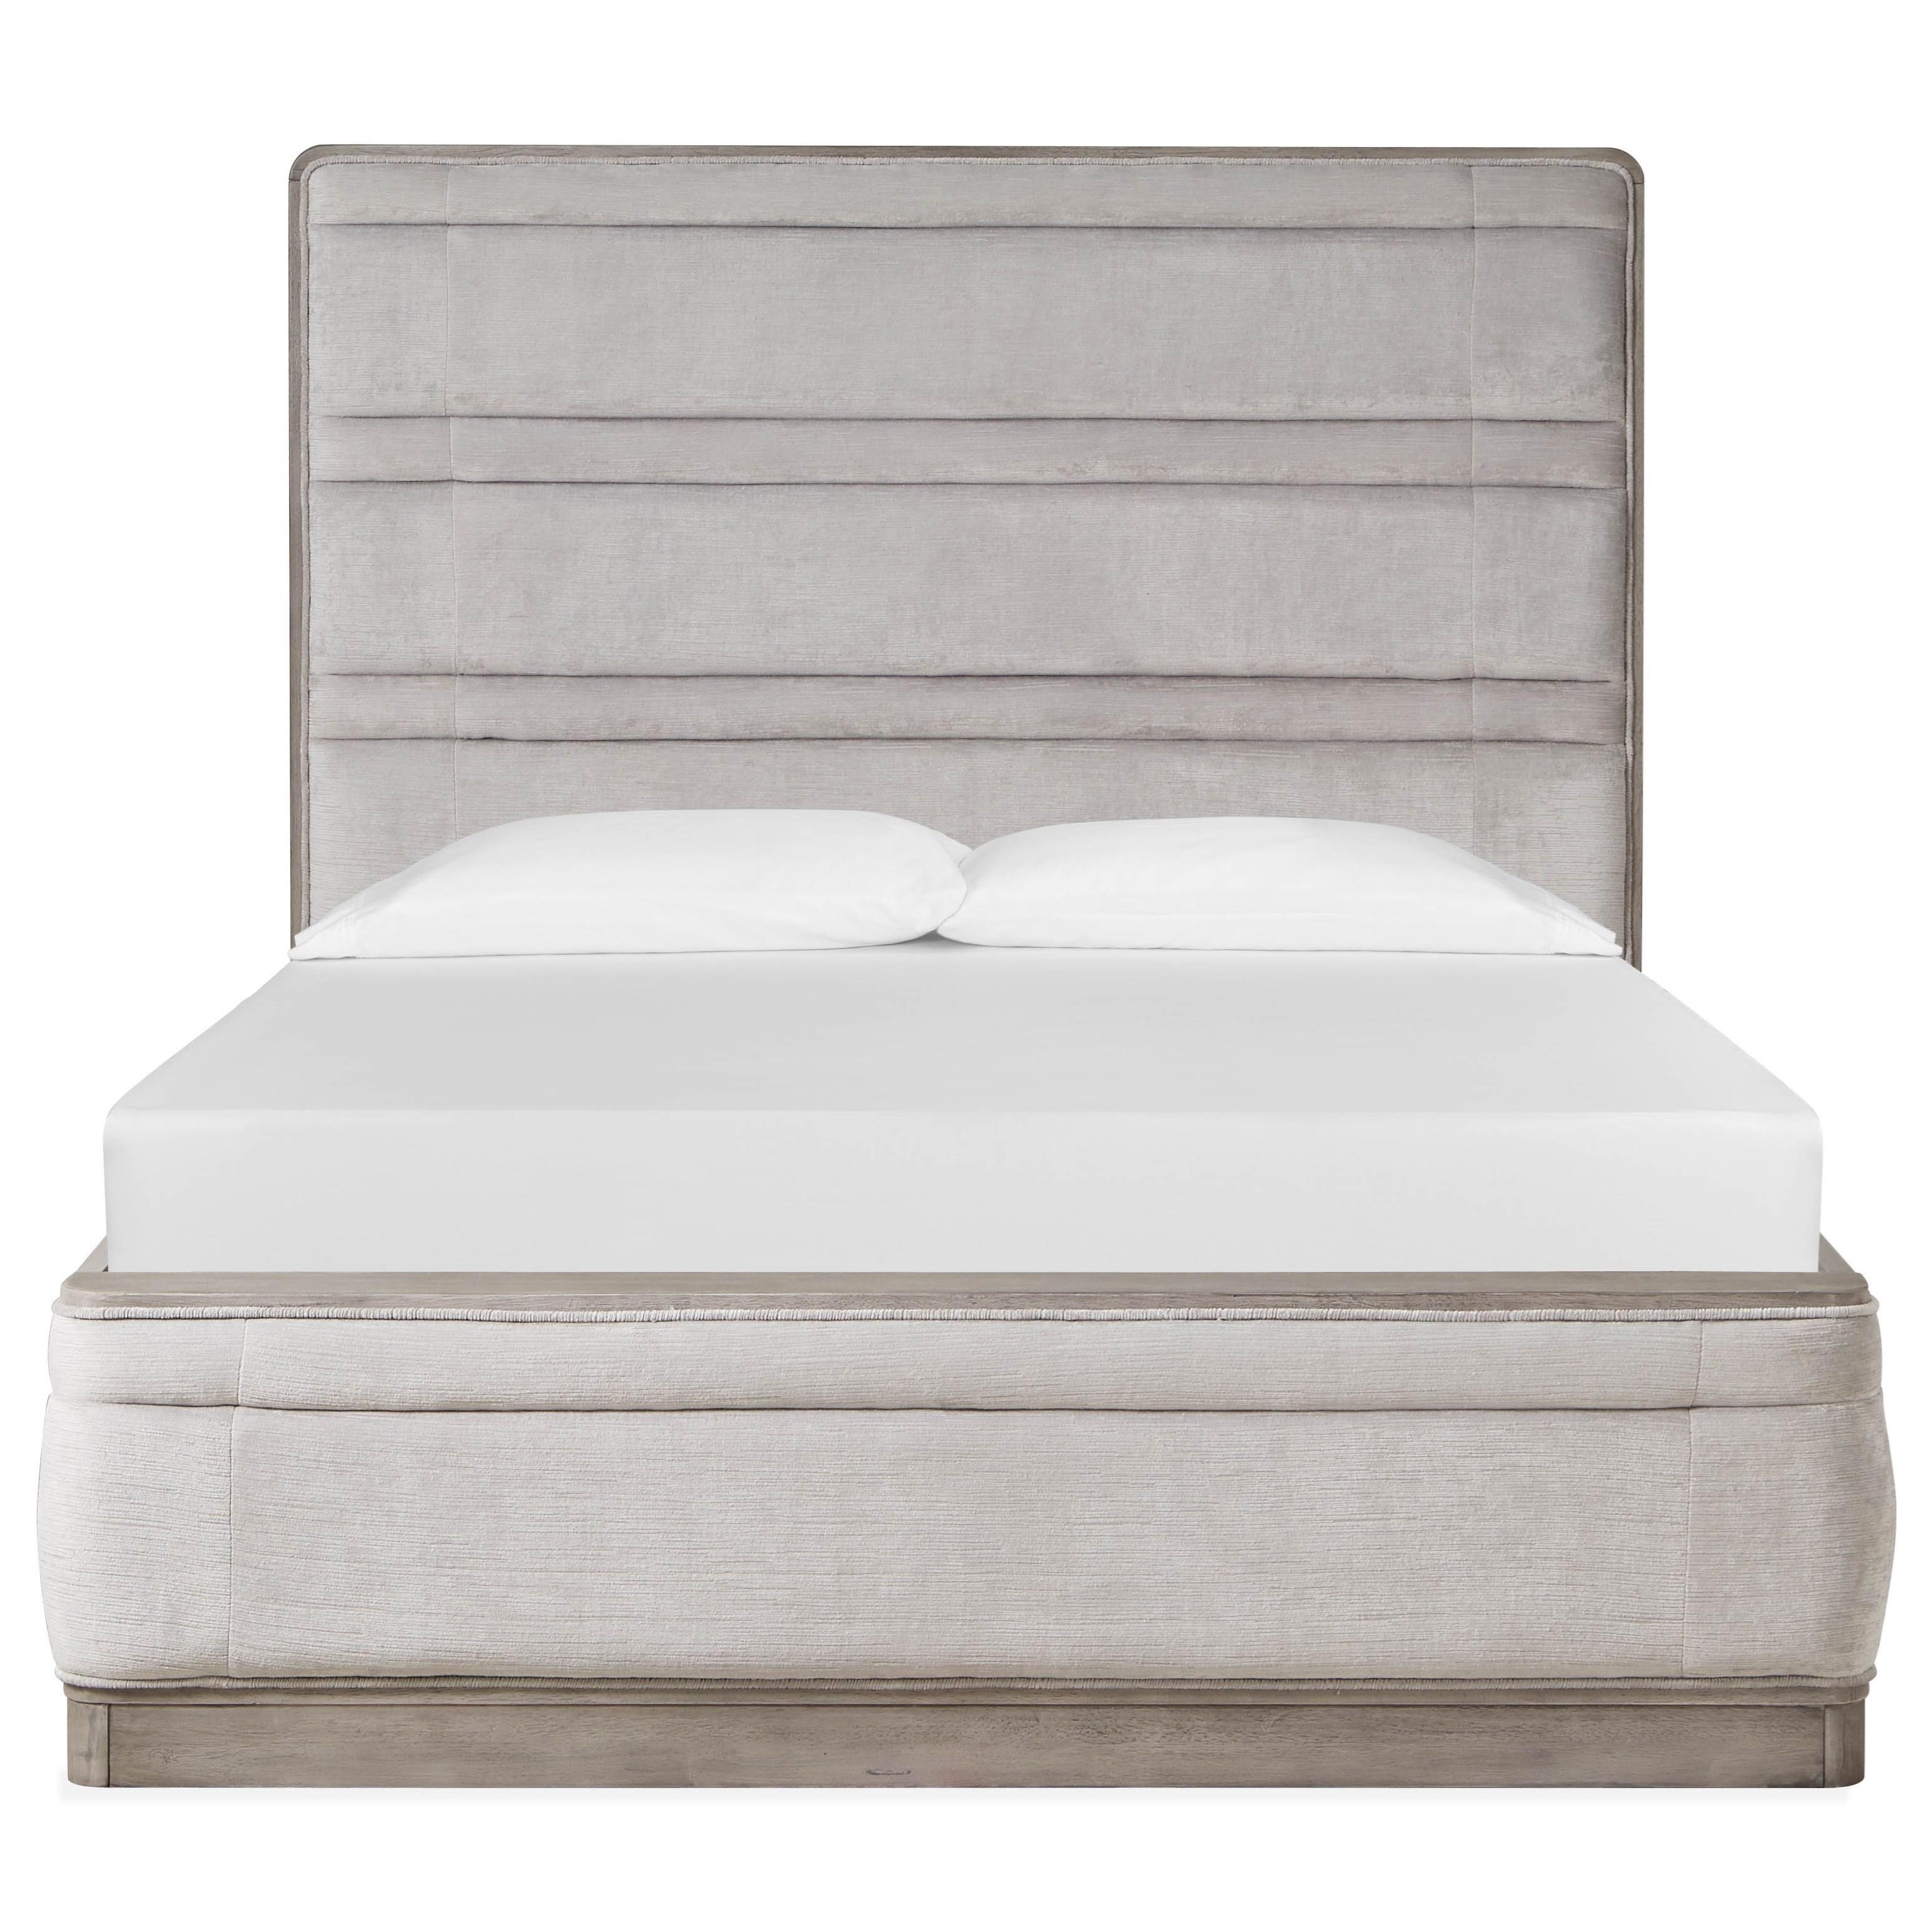 Upholstered California King Bed